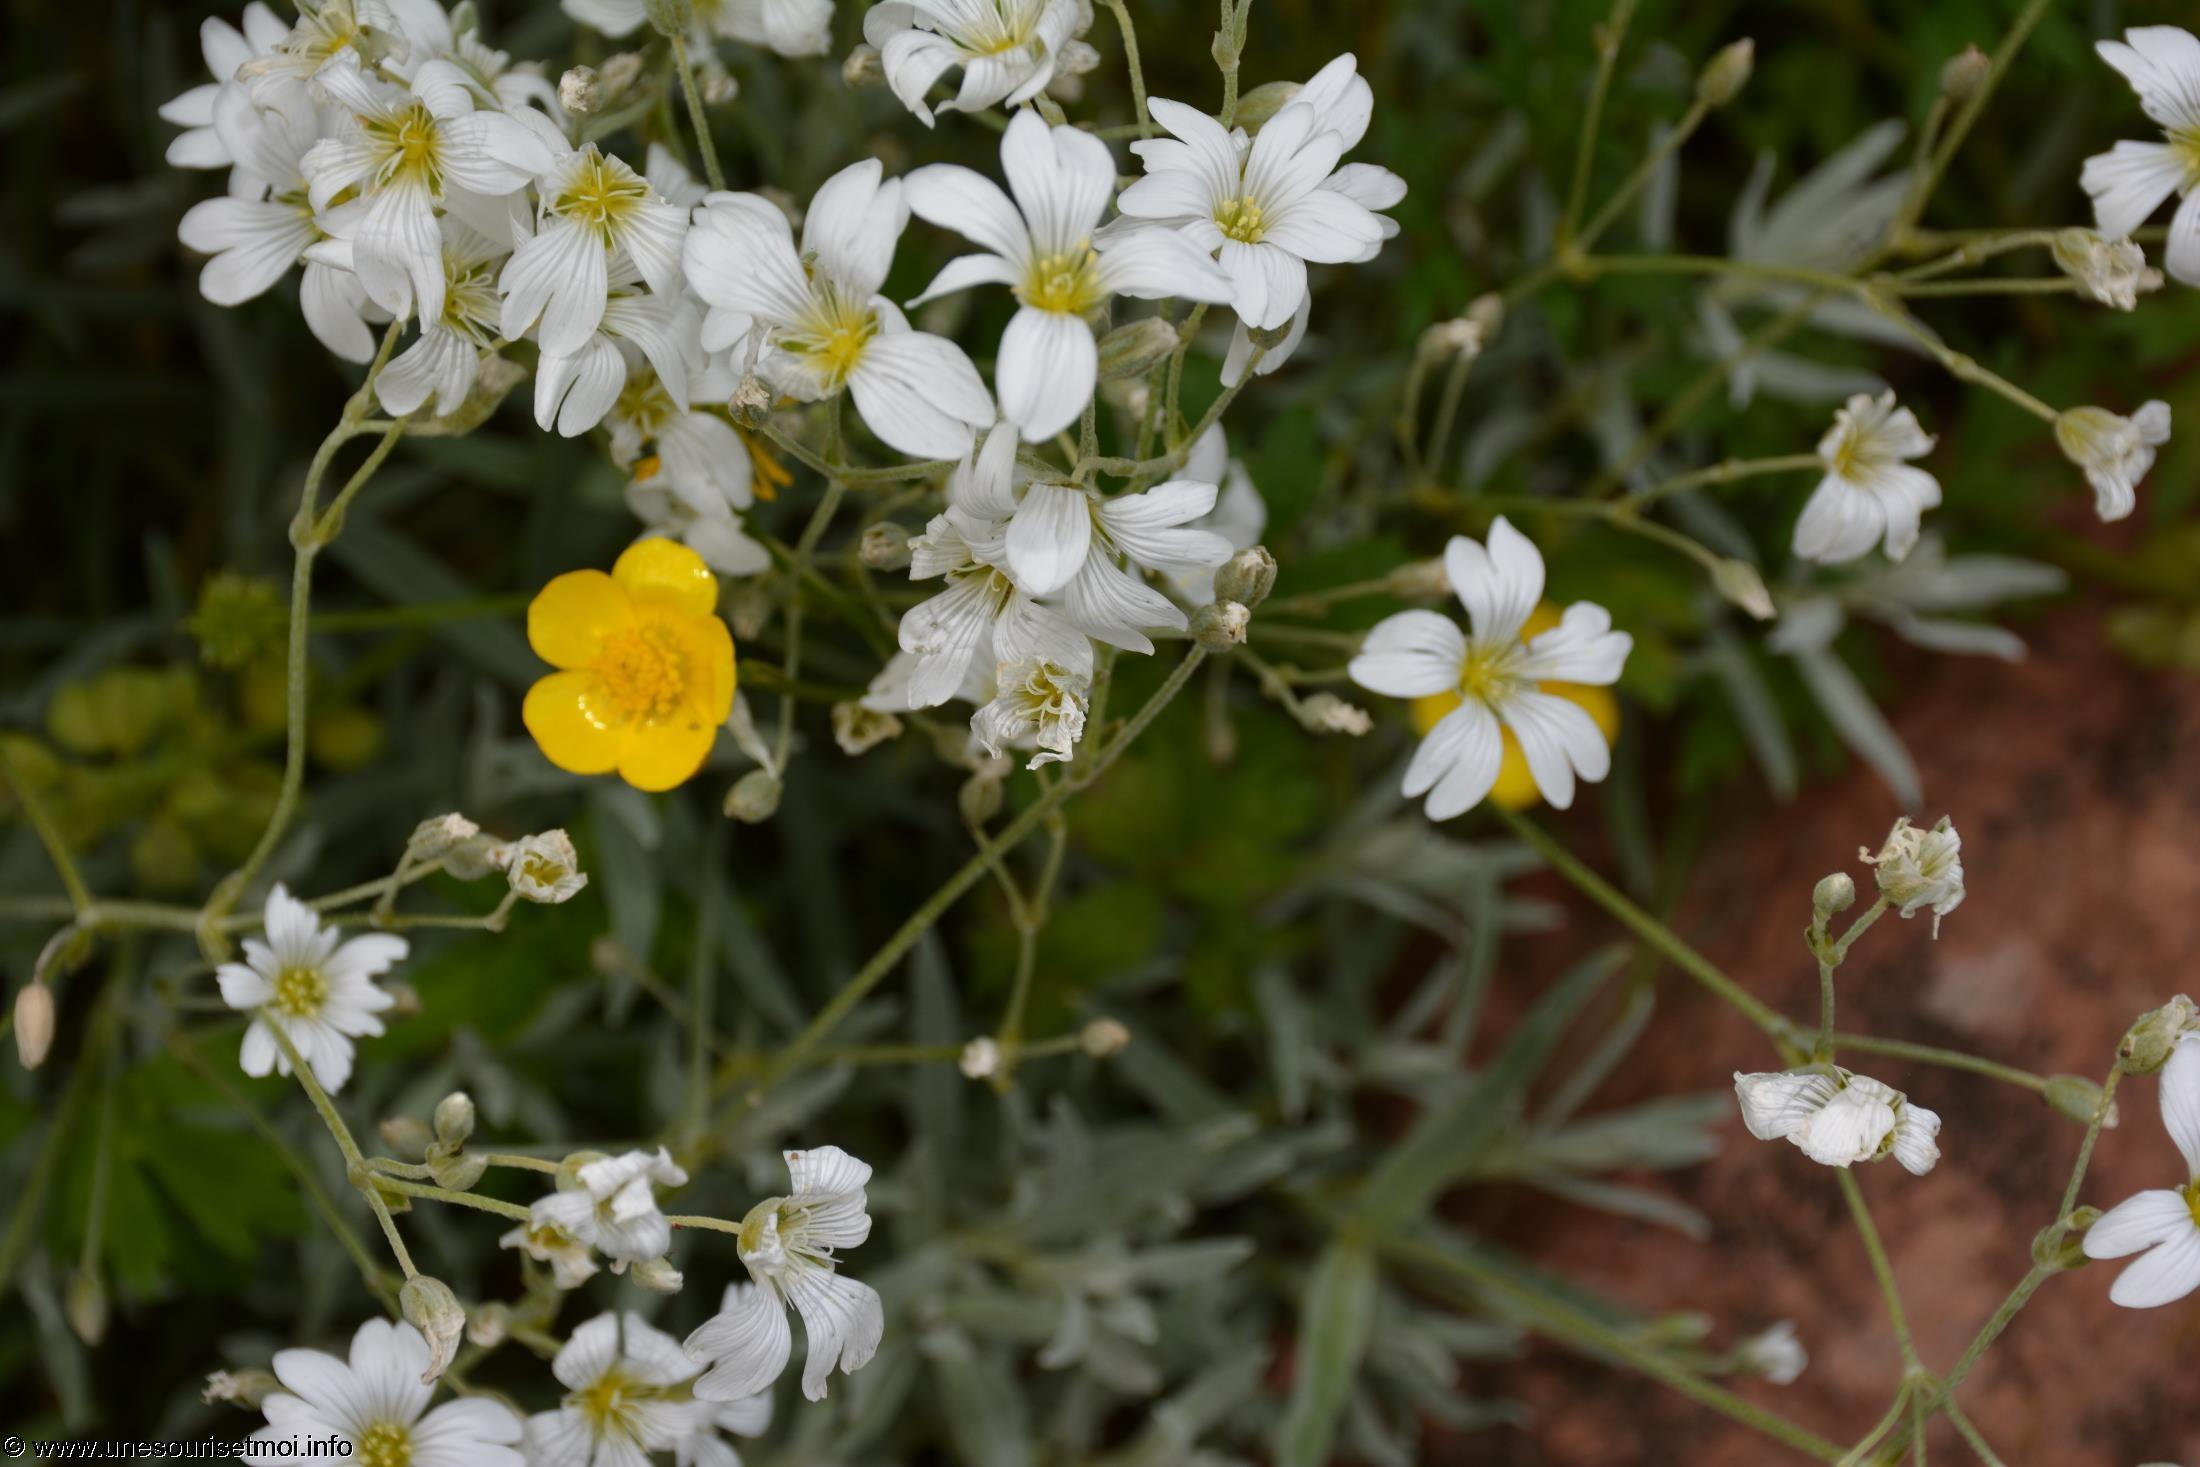 fleurs-ete-printemps-du-jardin-en-grand-format-HD_5